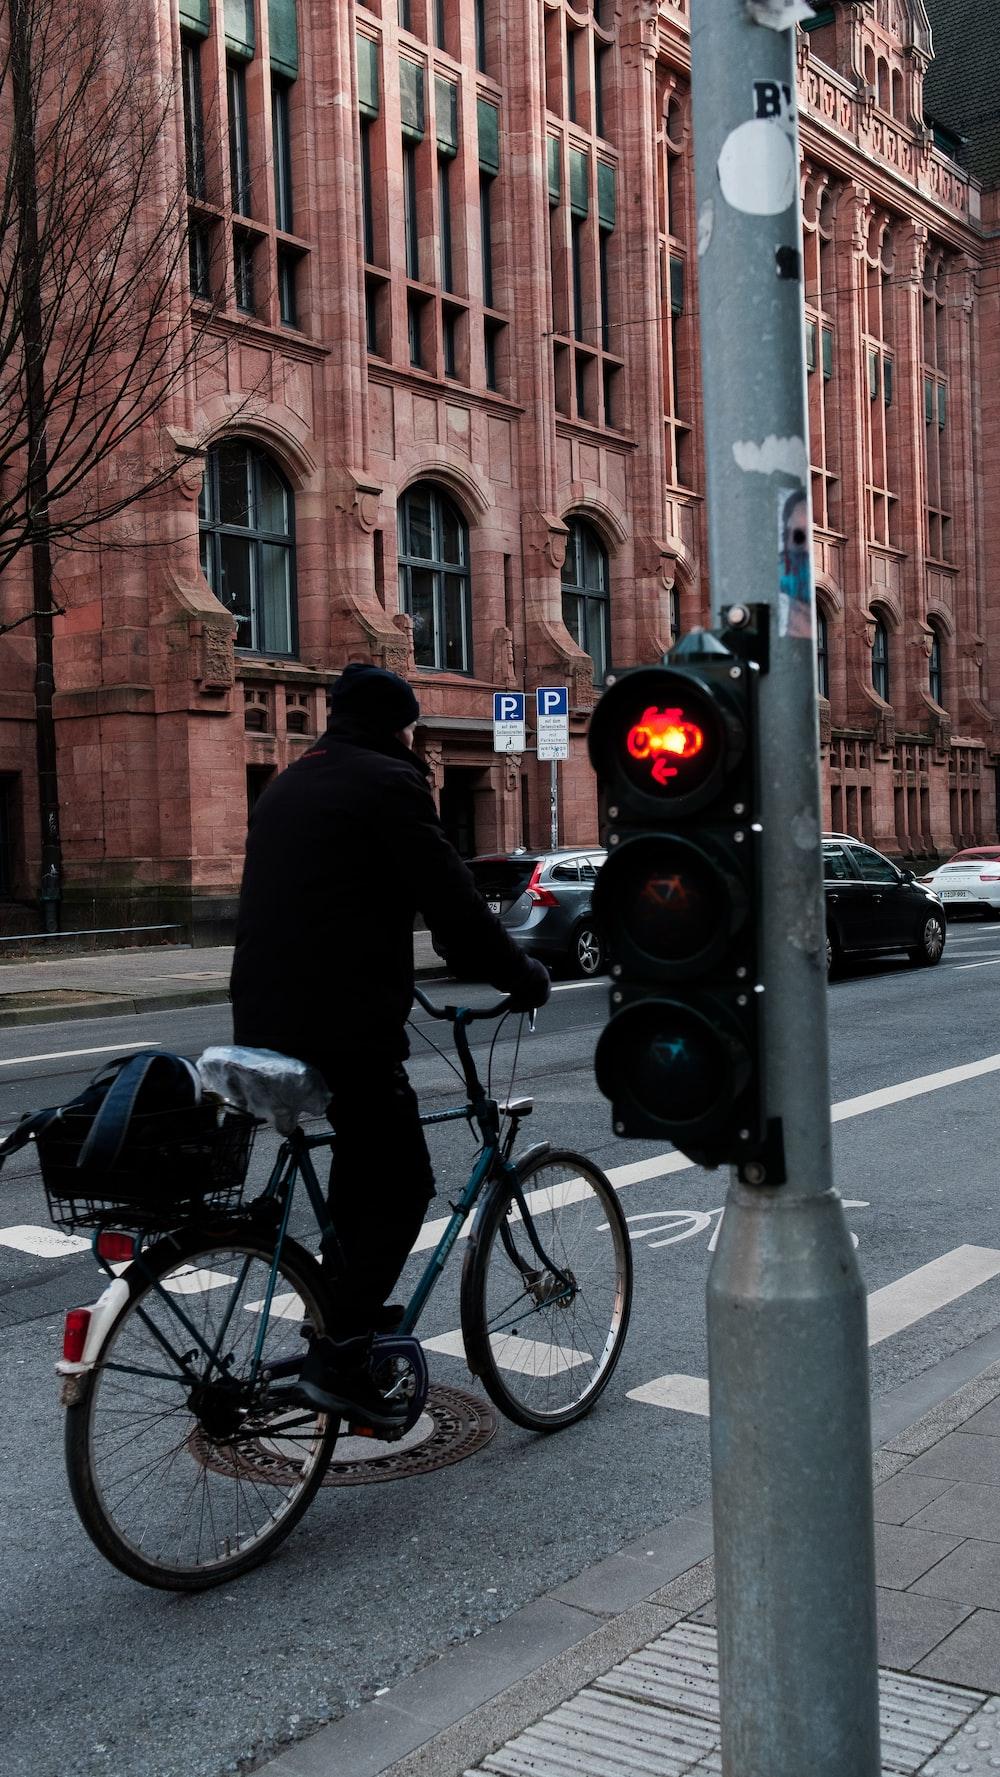 man in black jacket riding bicycle on road during daytime